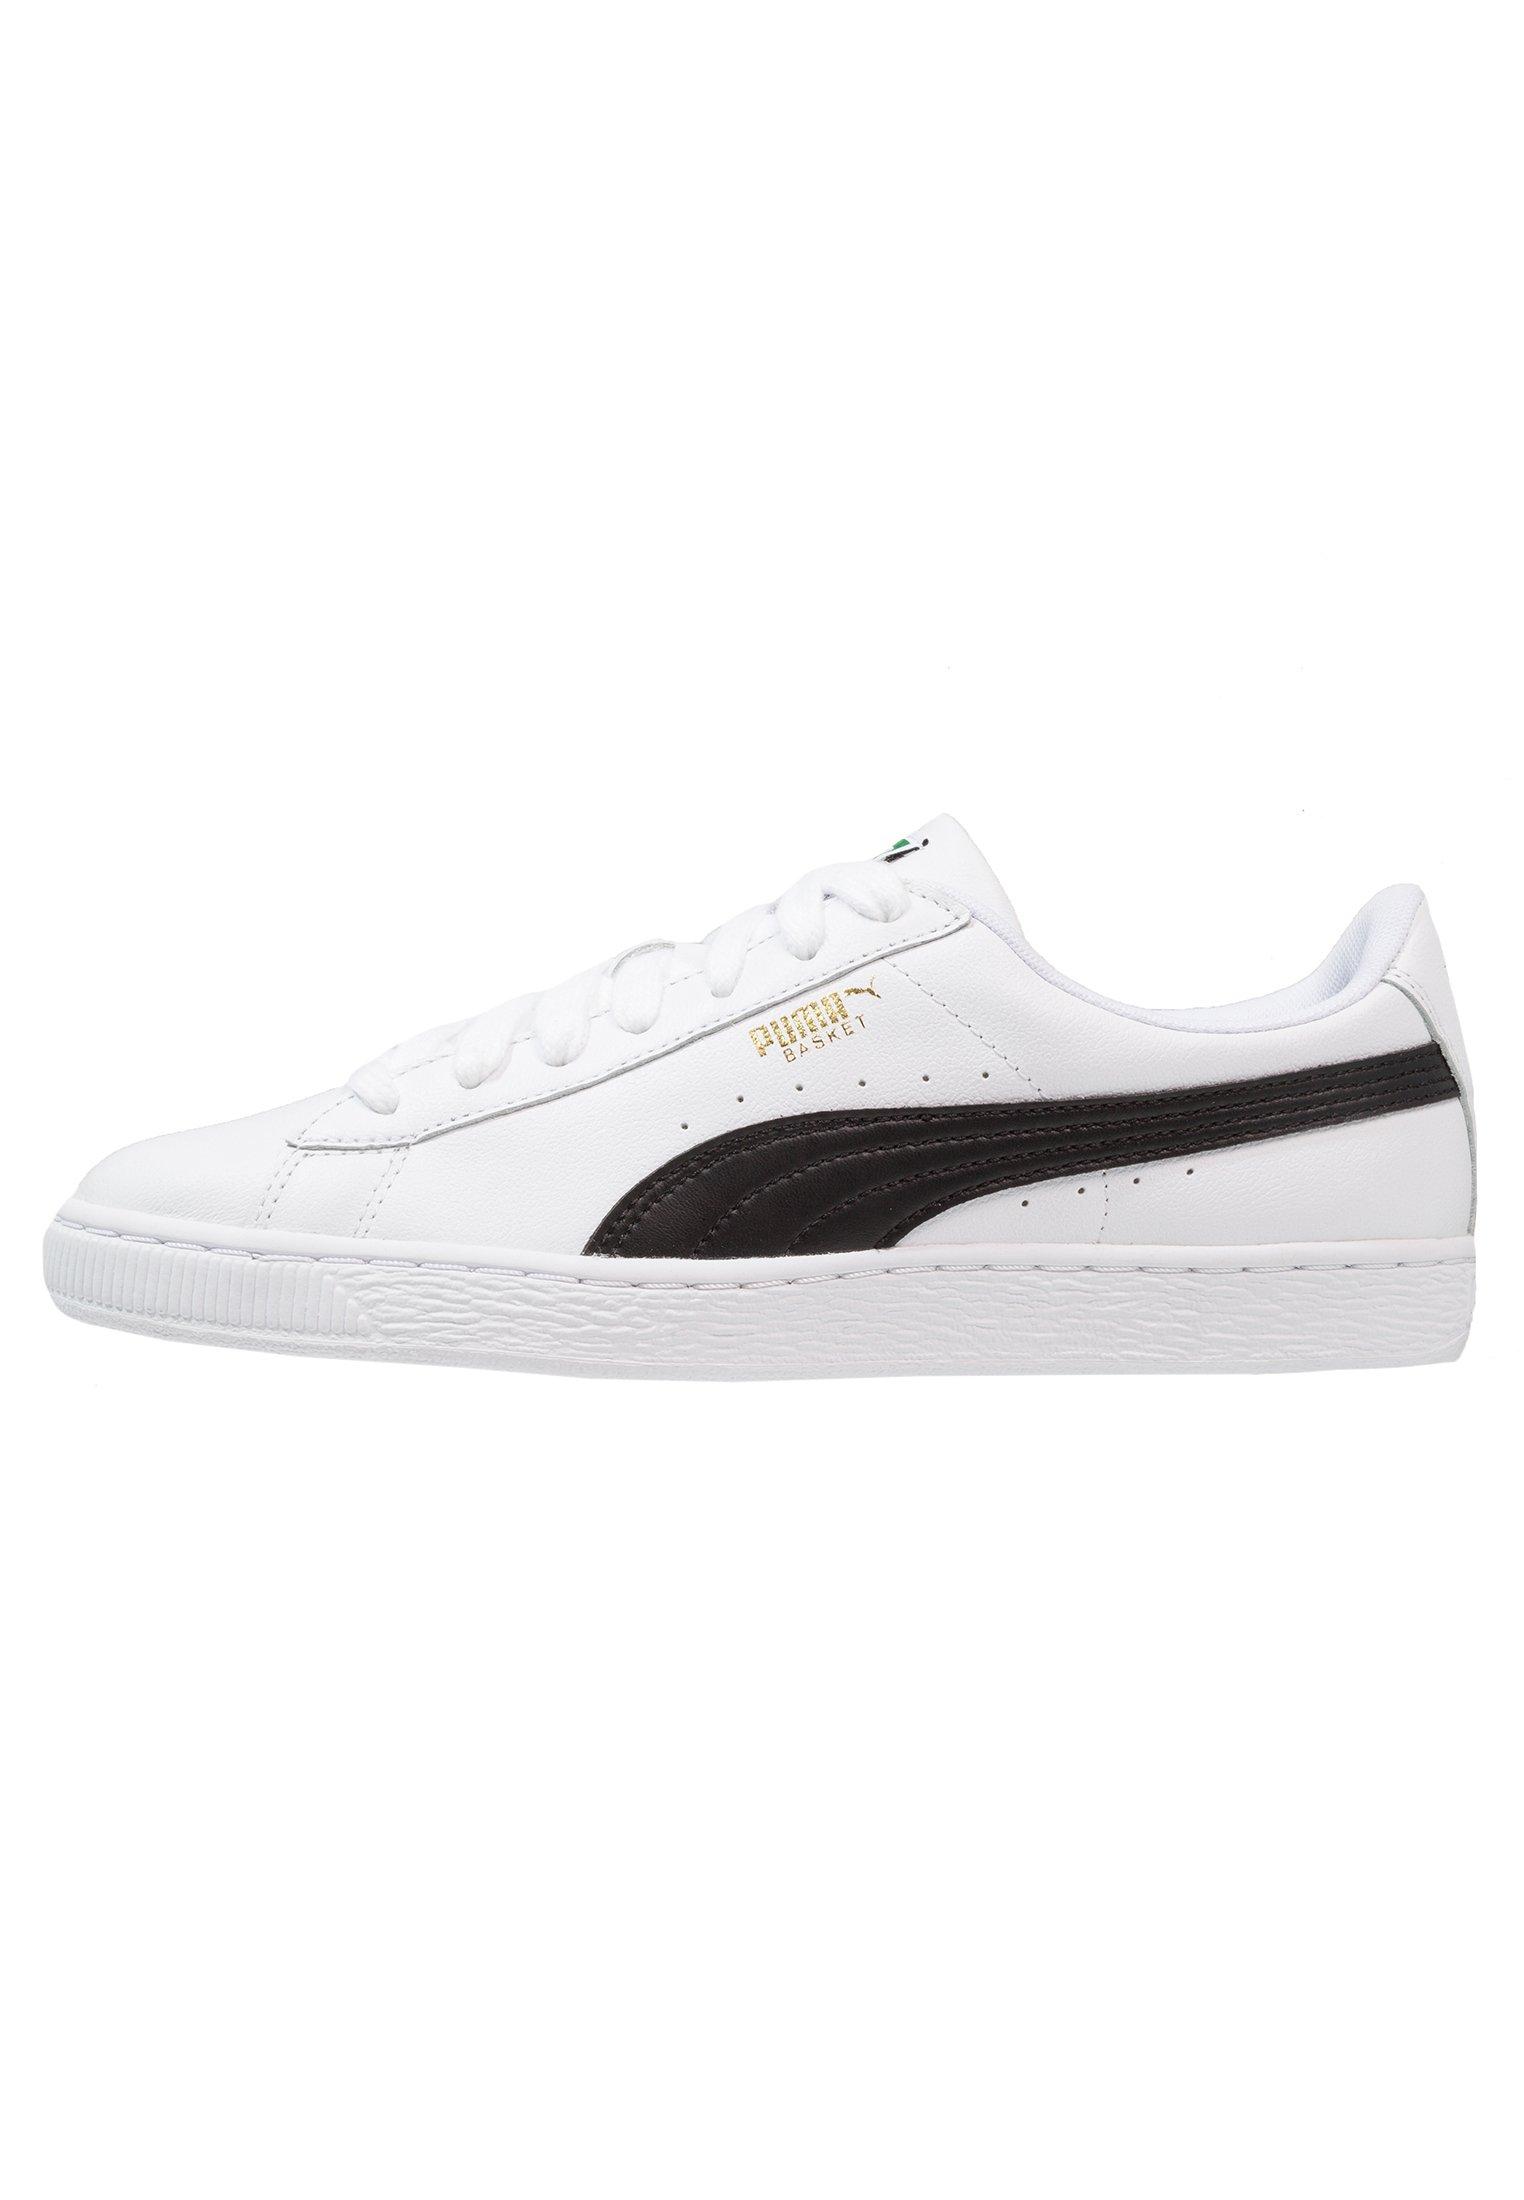 Puma BASKET CLASSIC - Baskets basses - white/black/blanc - ZALANDO.FR